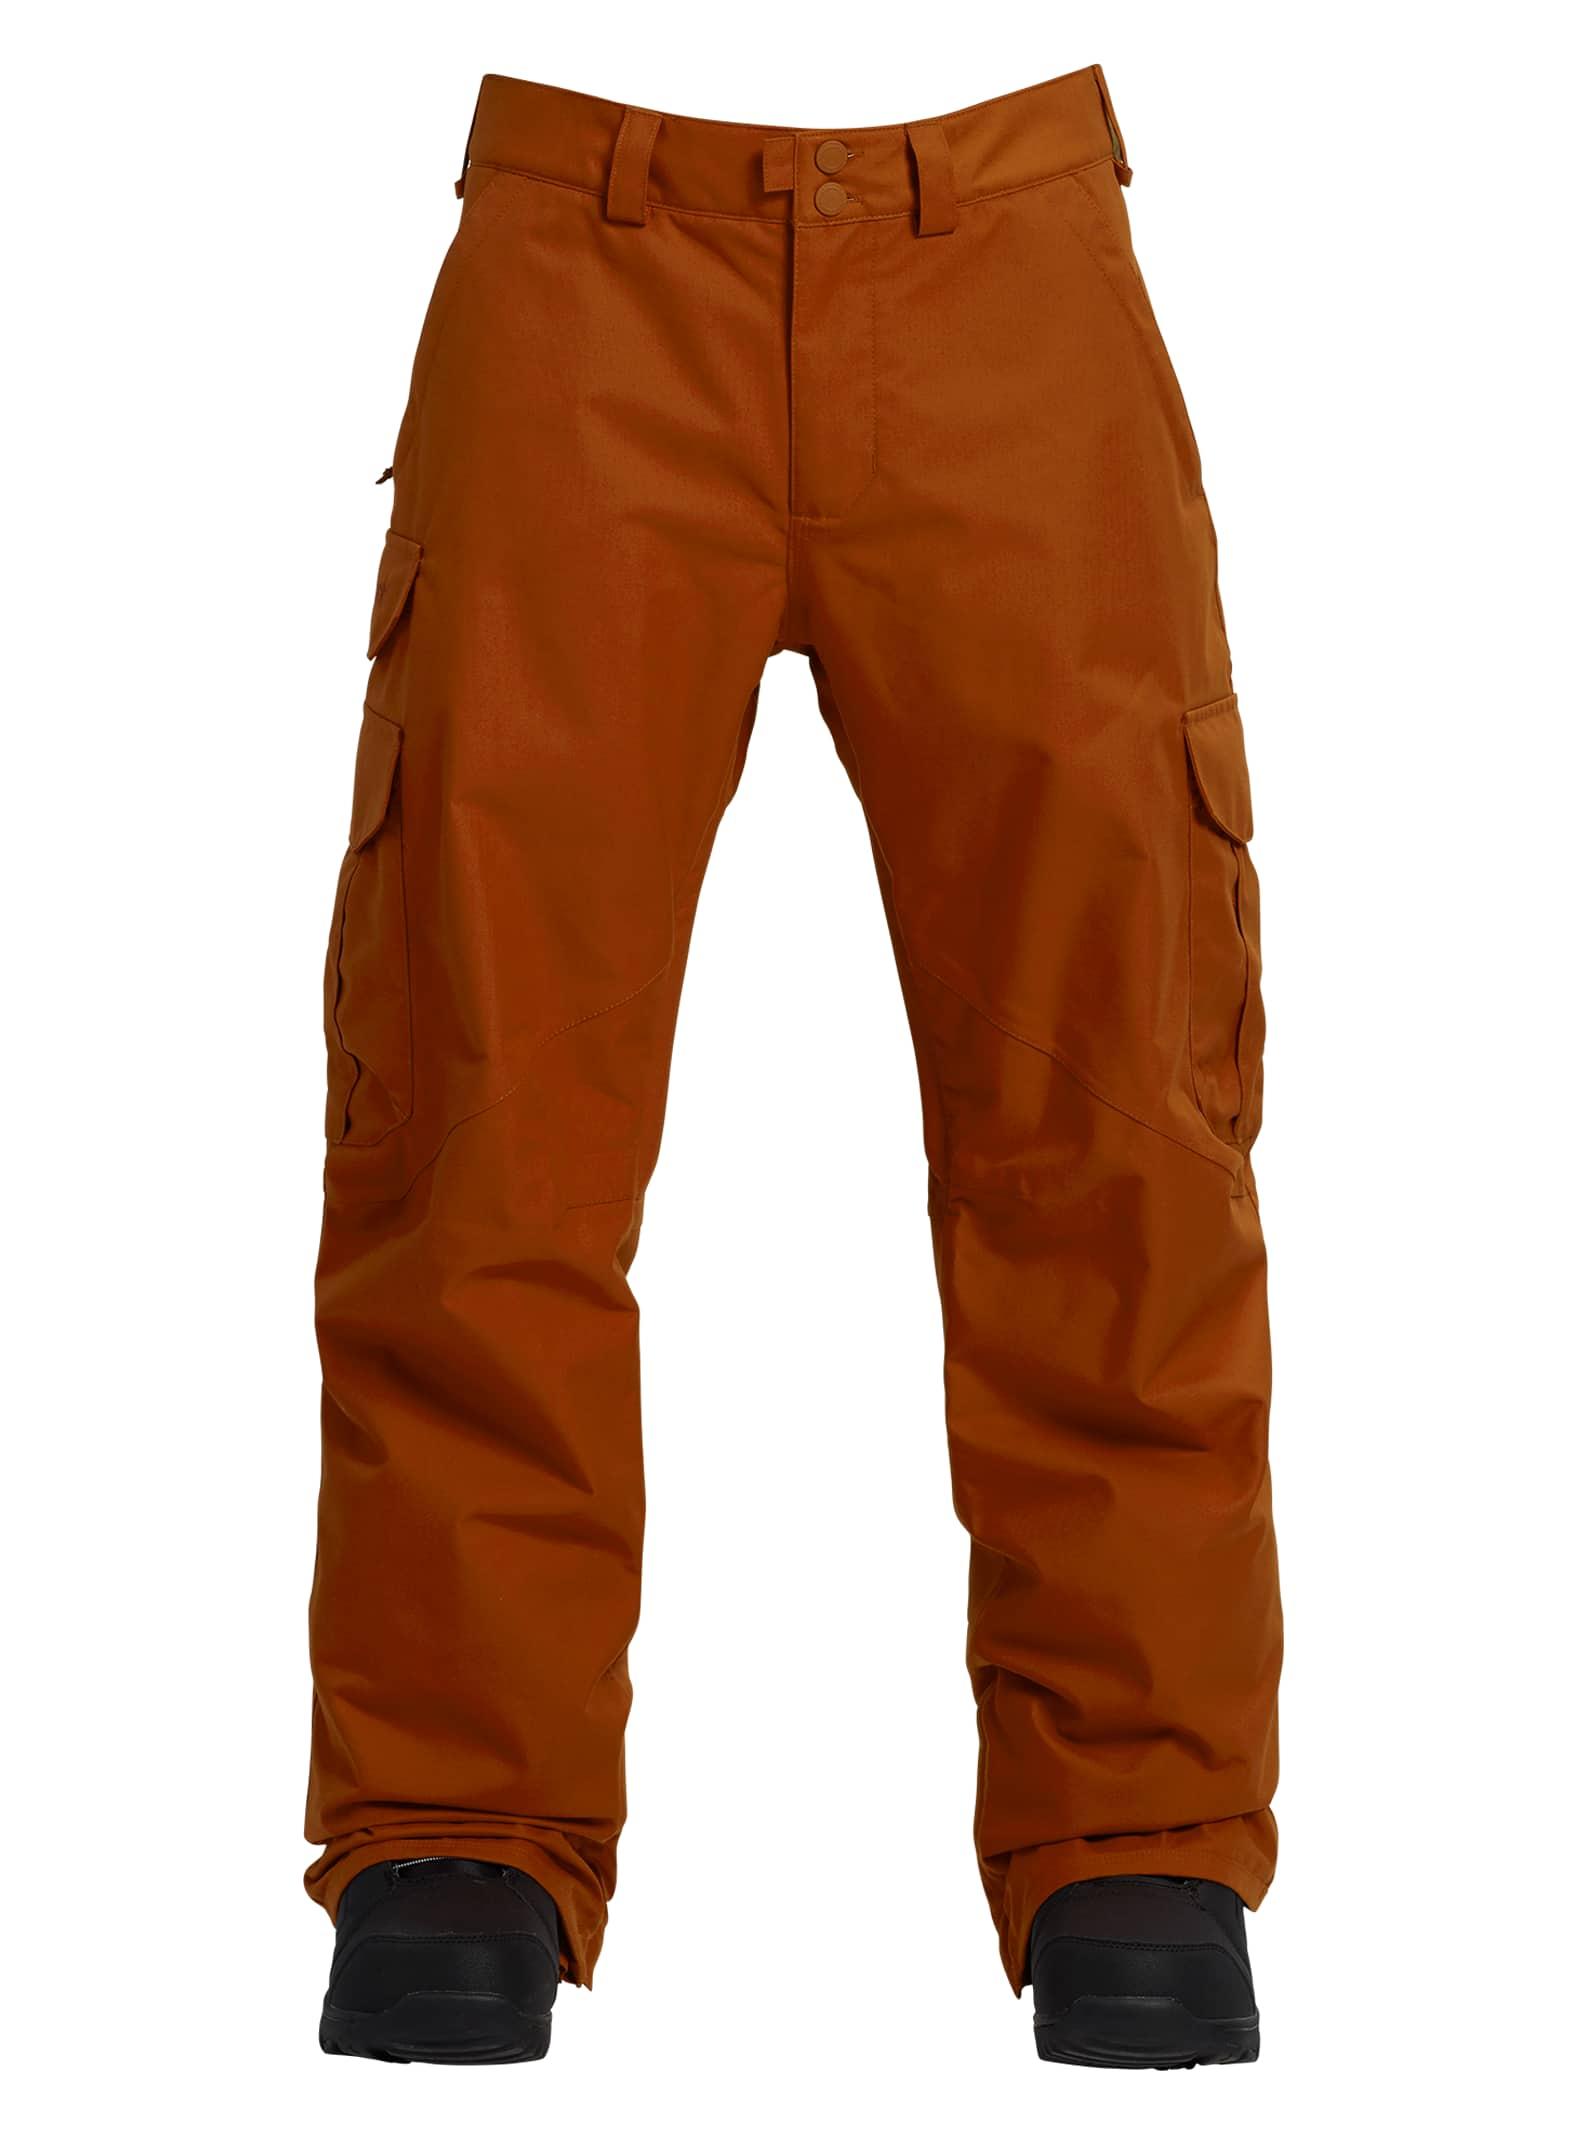 0251510b1b6 Men s Snowboard Pants   Bibs